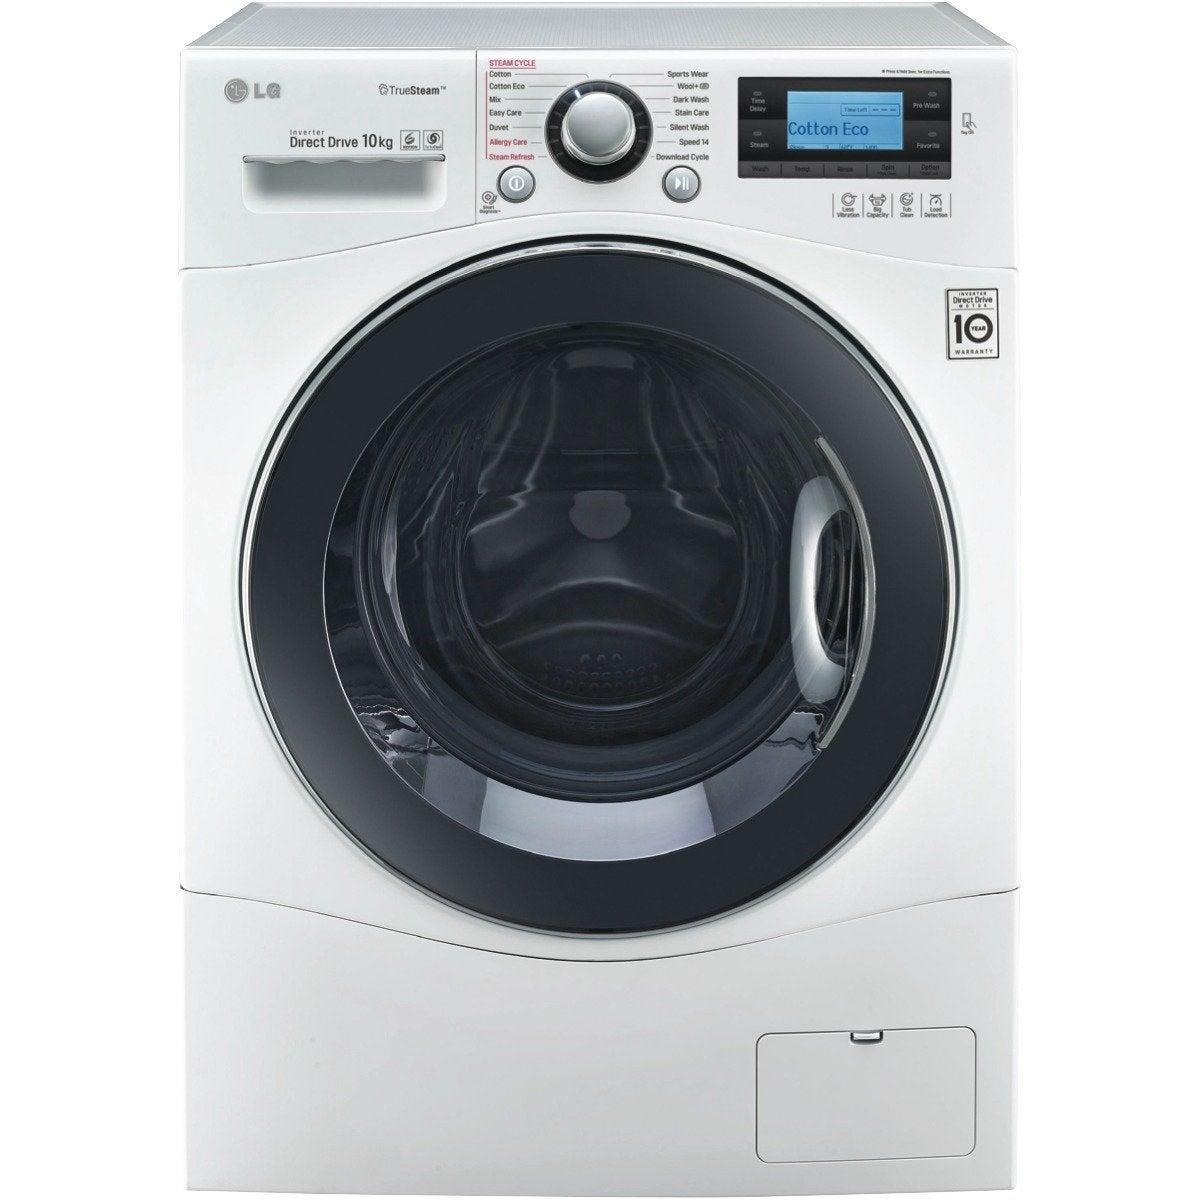 LG WD1410SBW Washing Machine